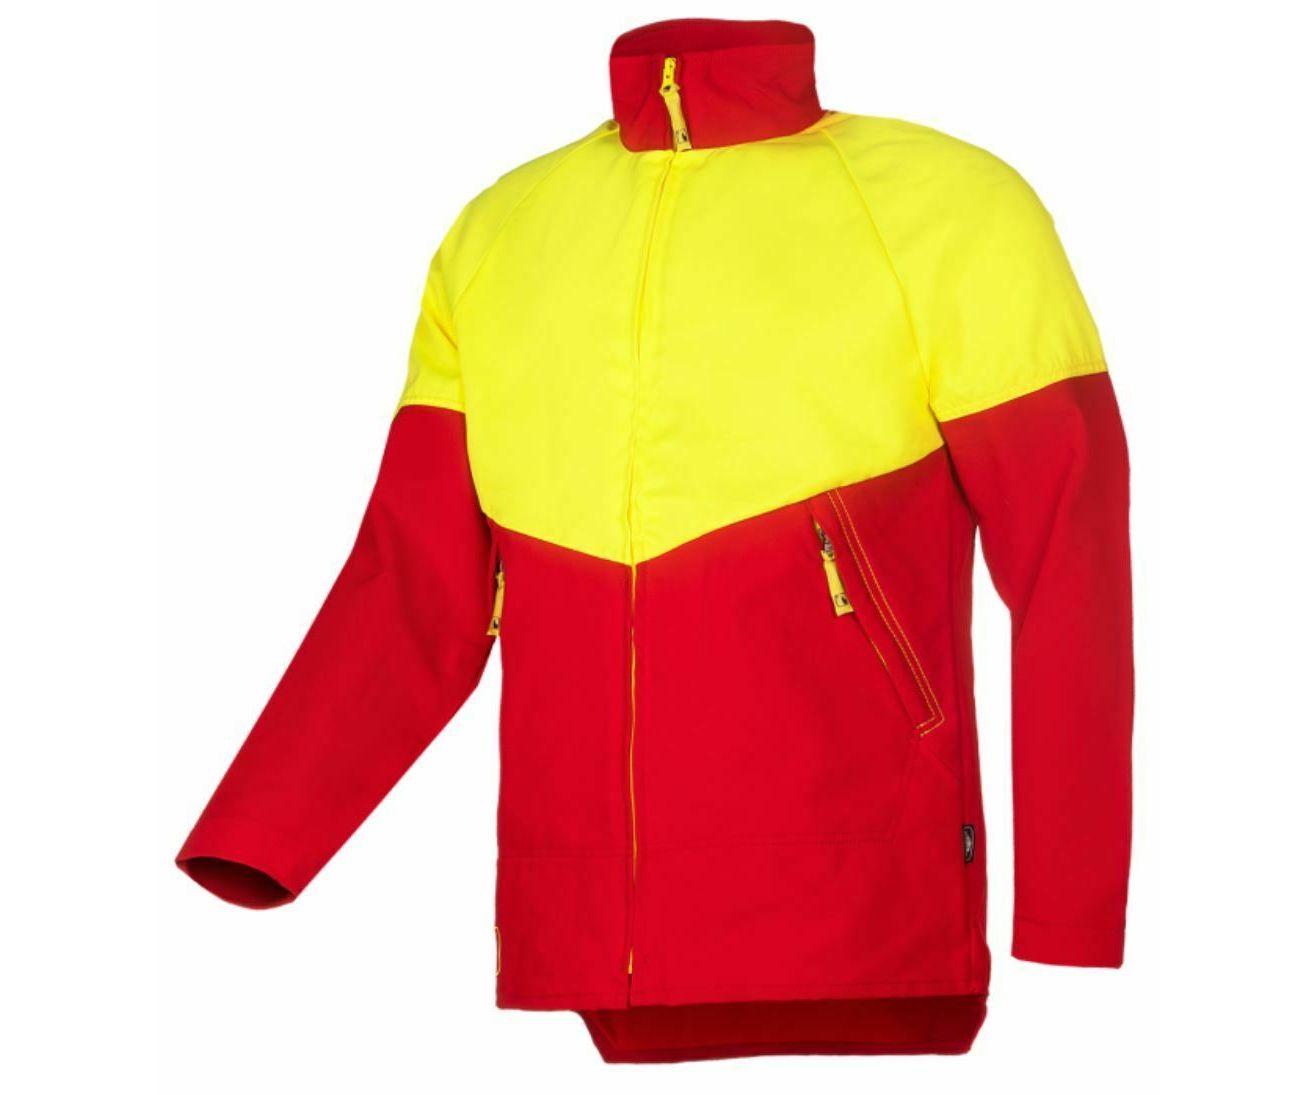 Wet Weather Clothing